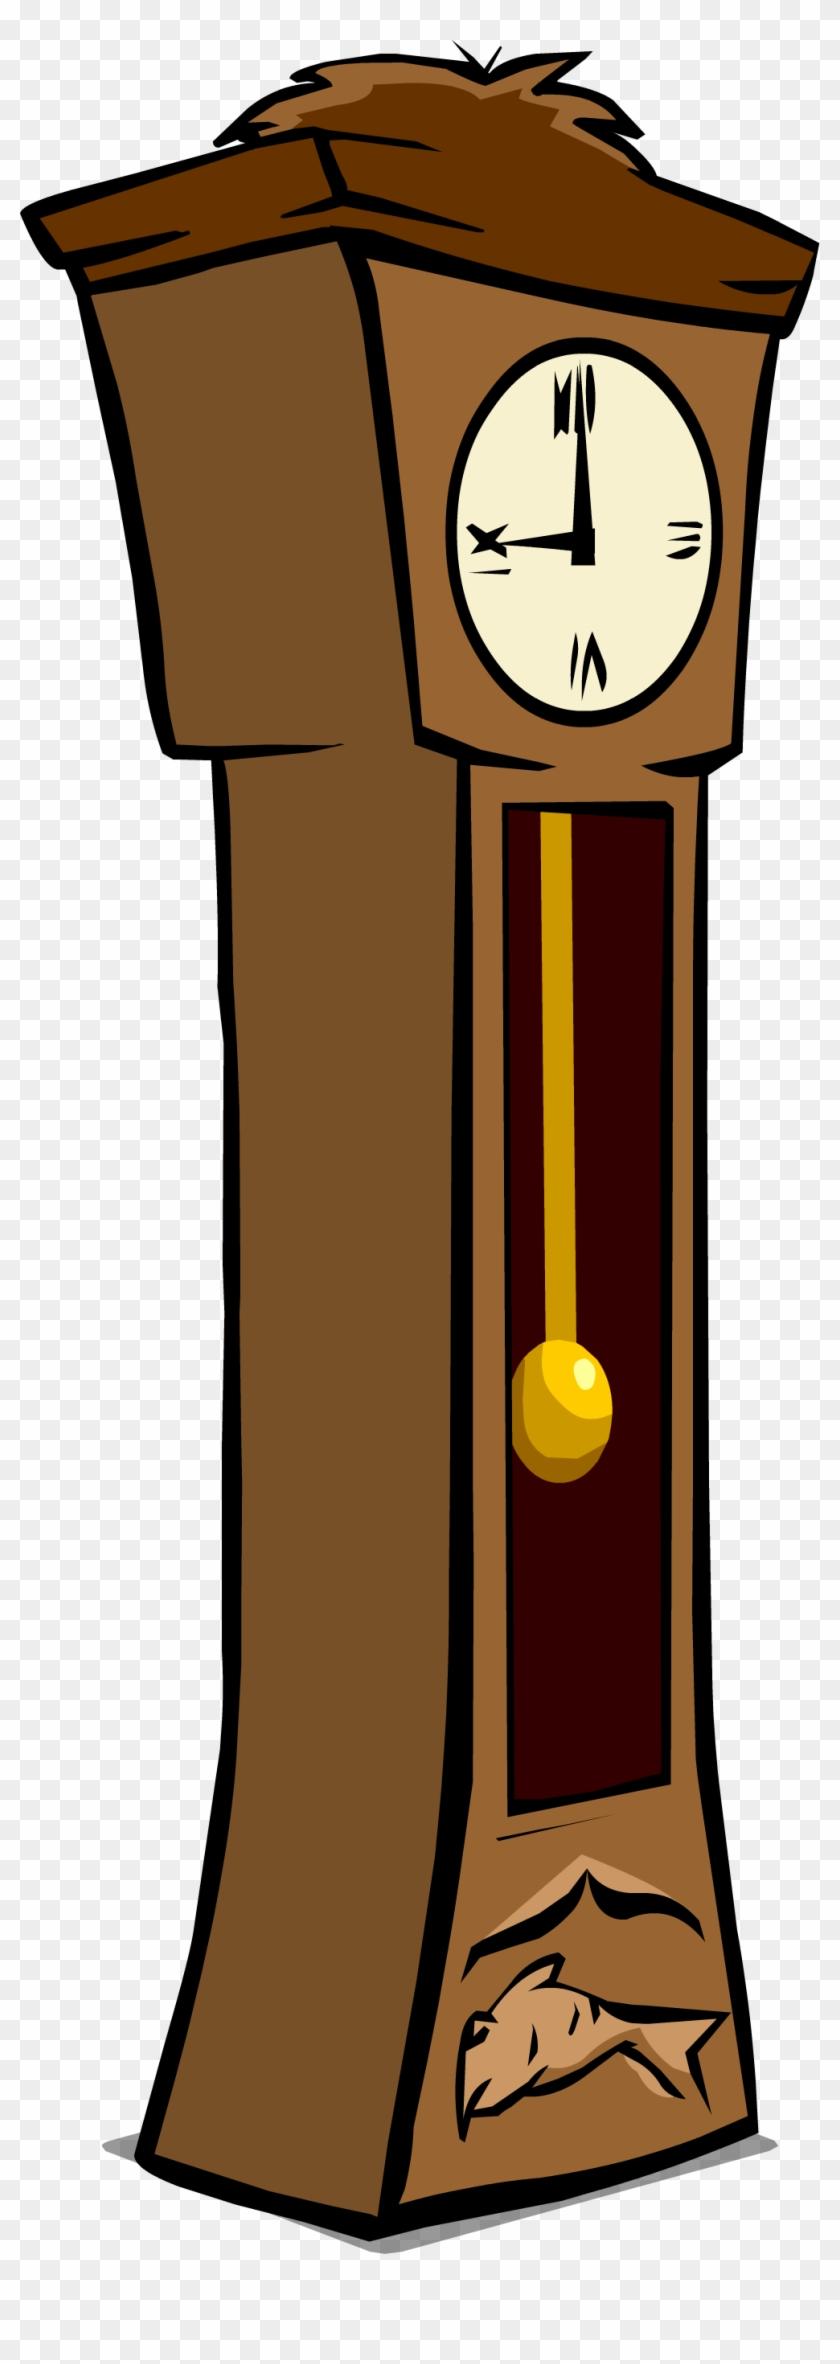 Grandfather Clock Sprite 003 - Clip Art Grandfather Clock #612977